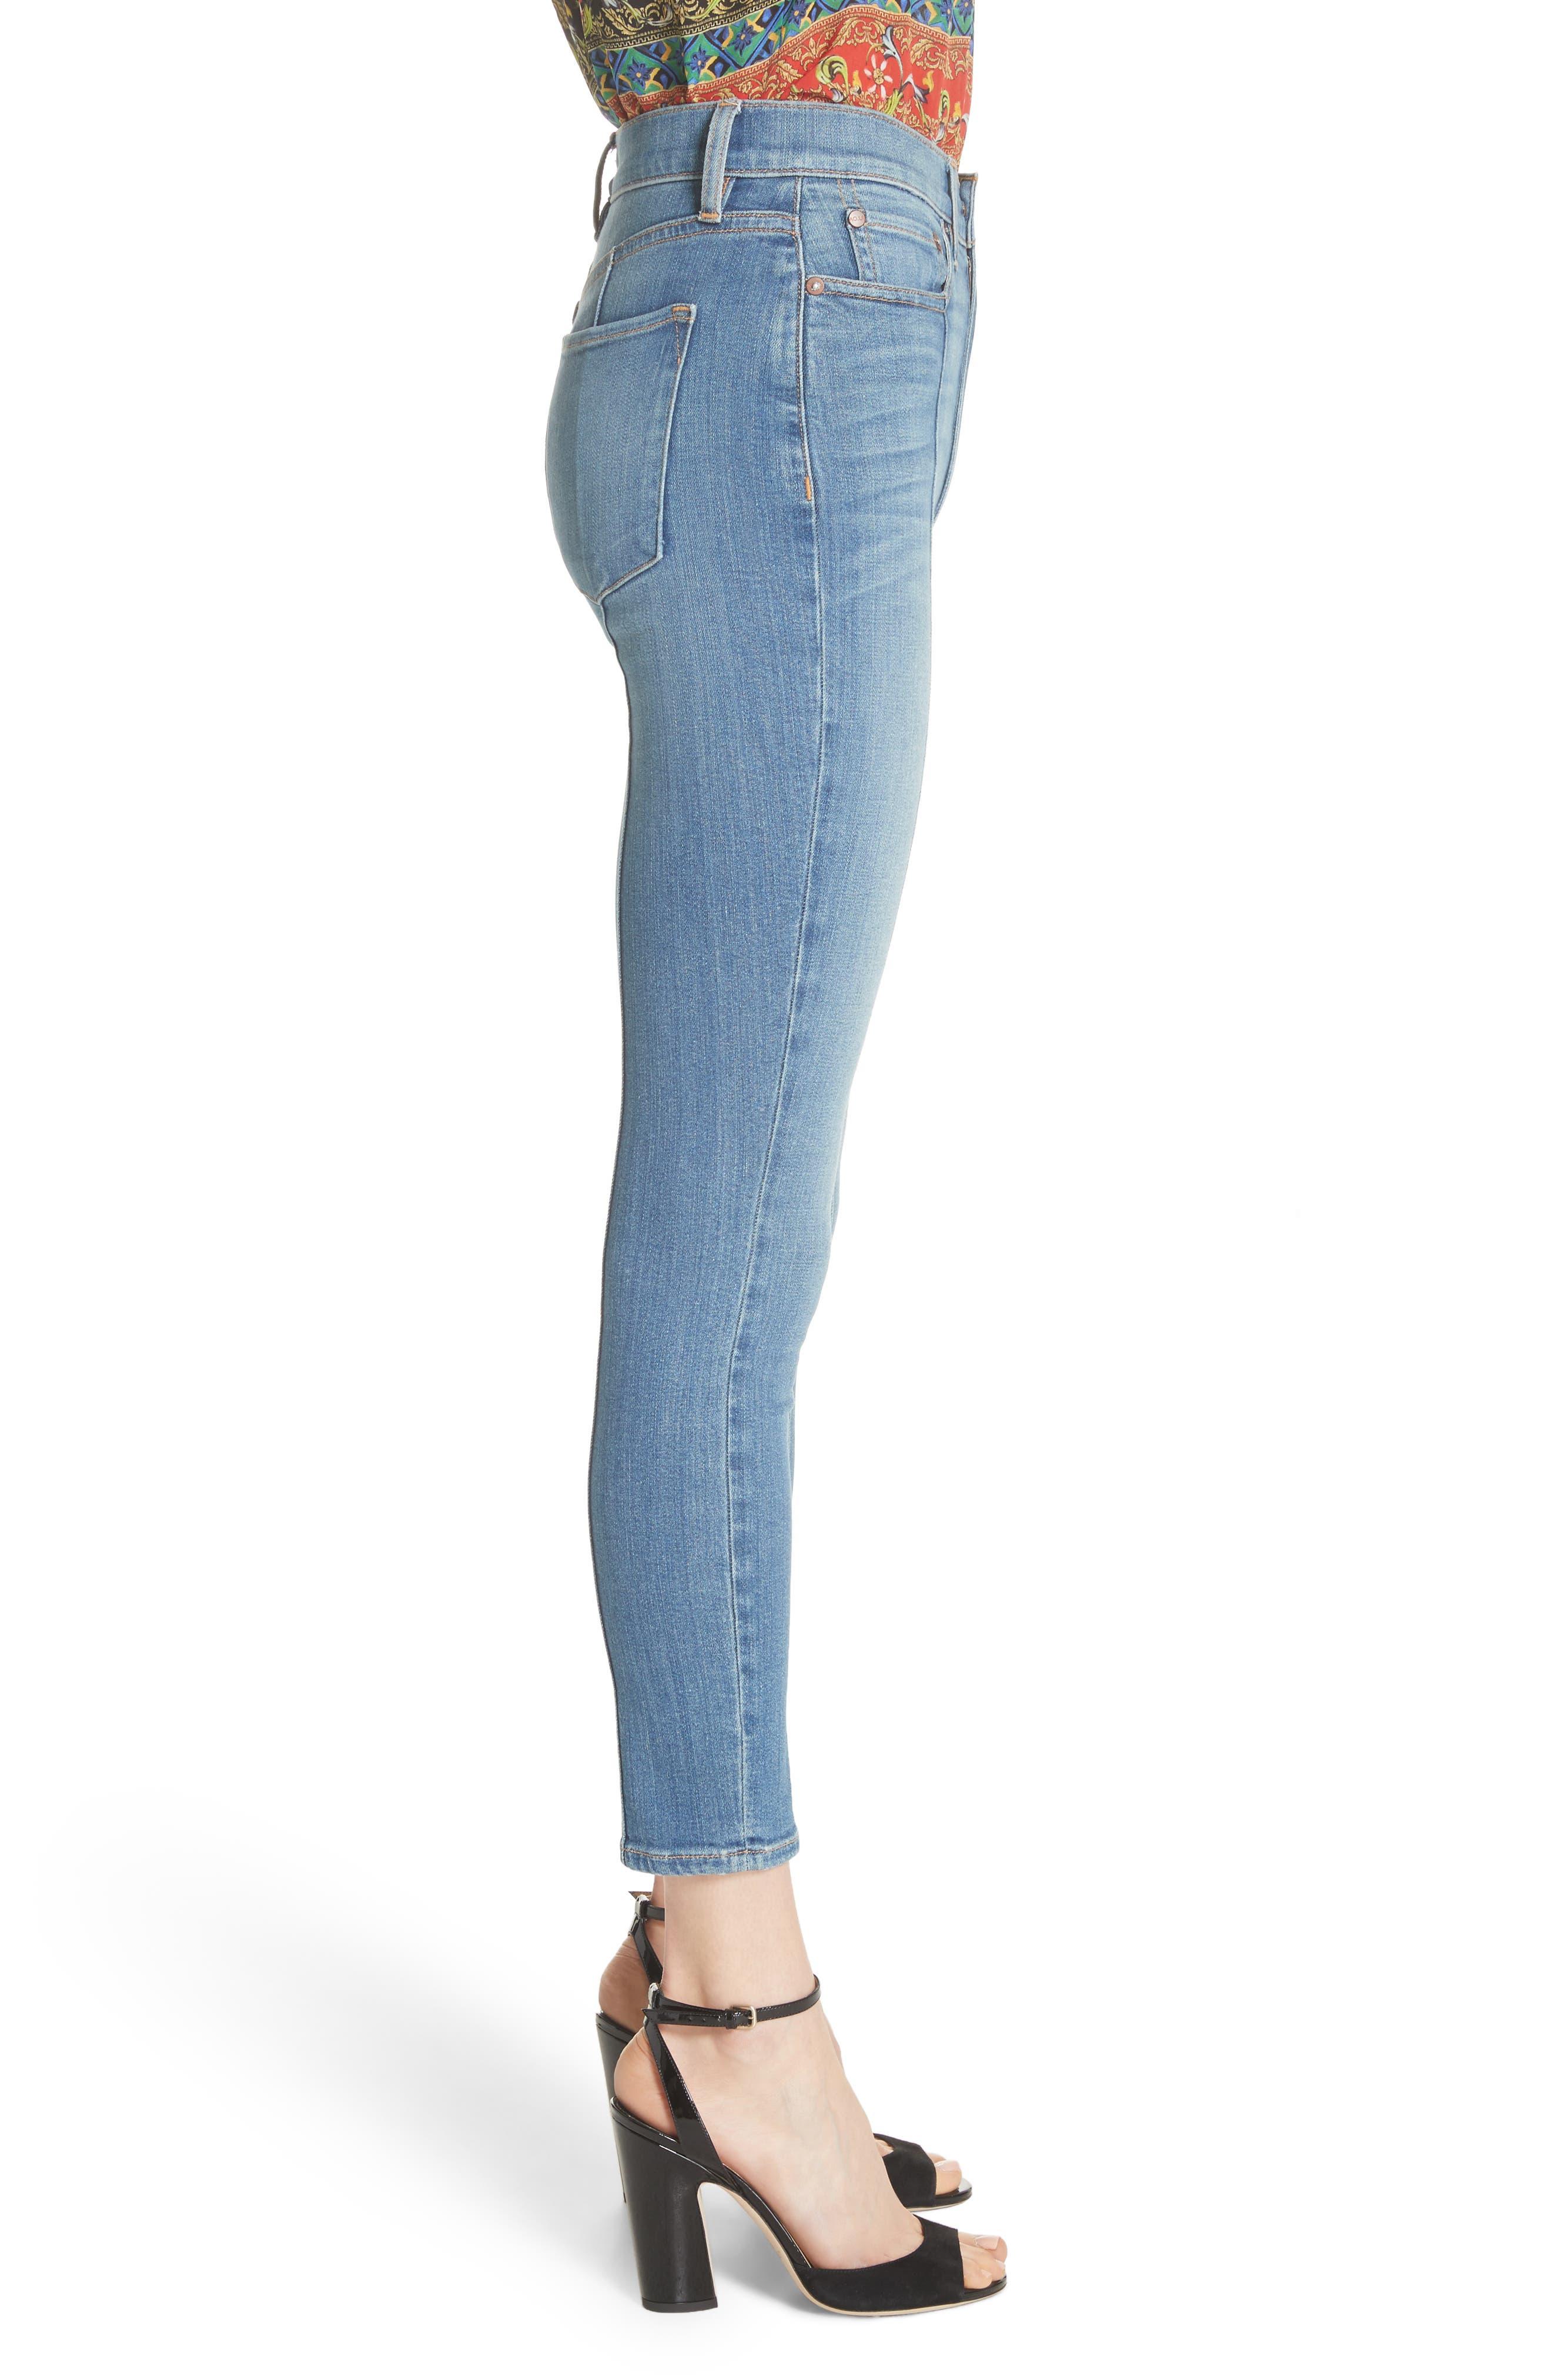 AO.LA Good High Waist Pintuck Skinny Jeans,                             Alternate thumbnail 3, color,                             482